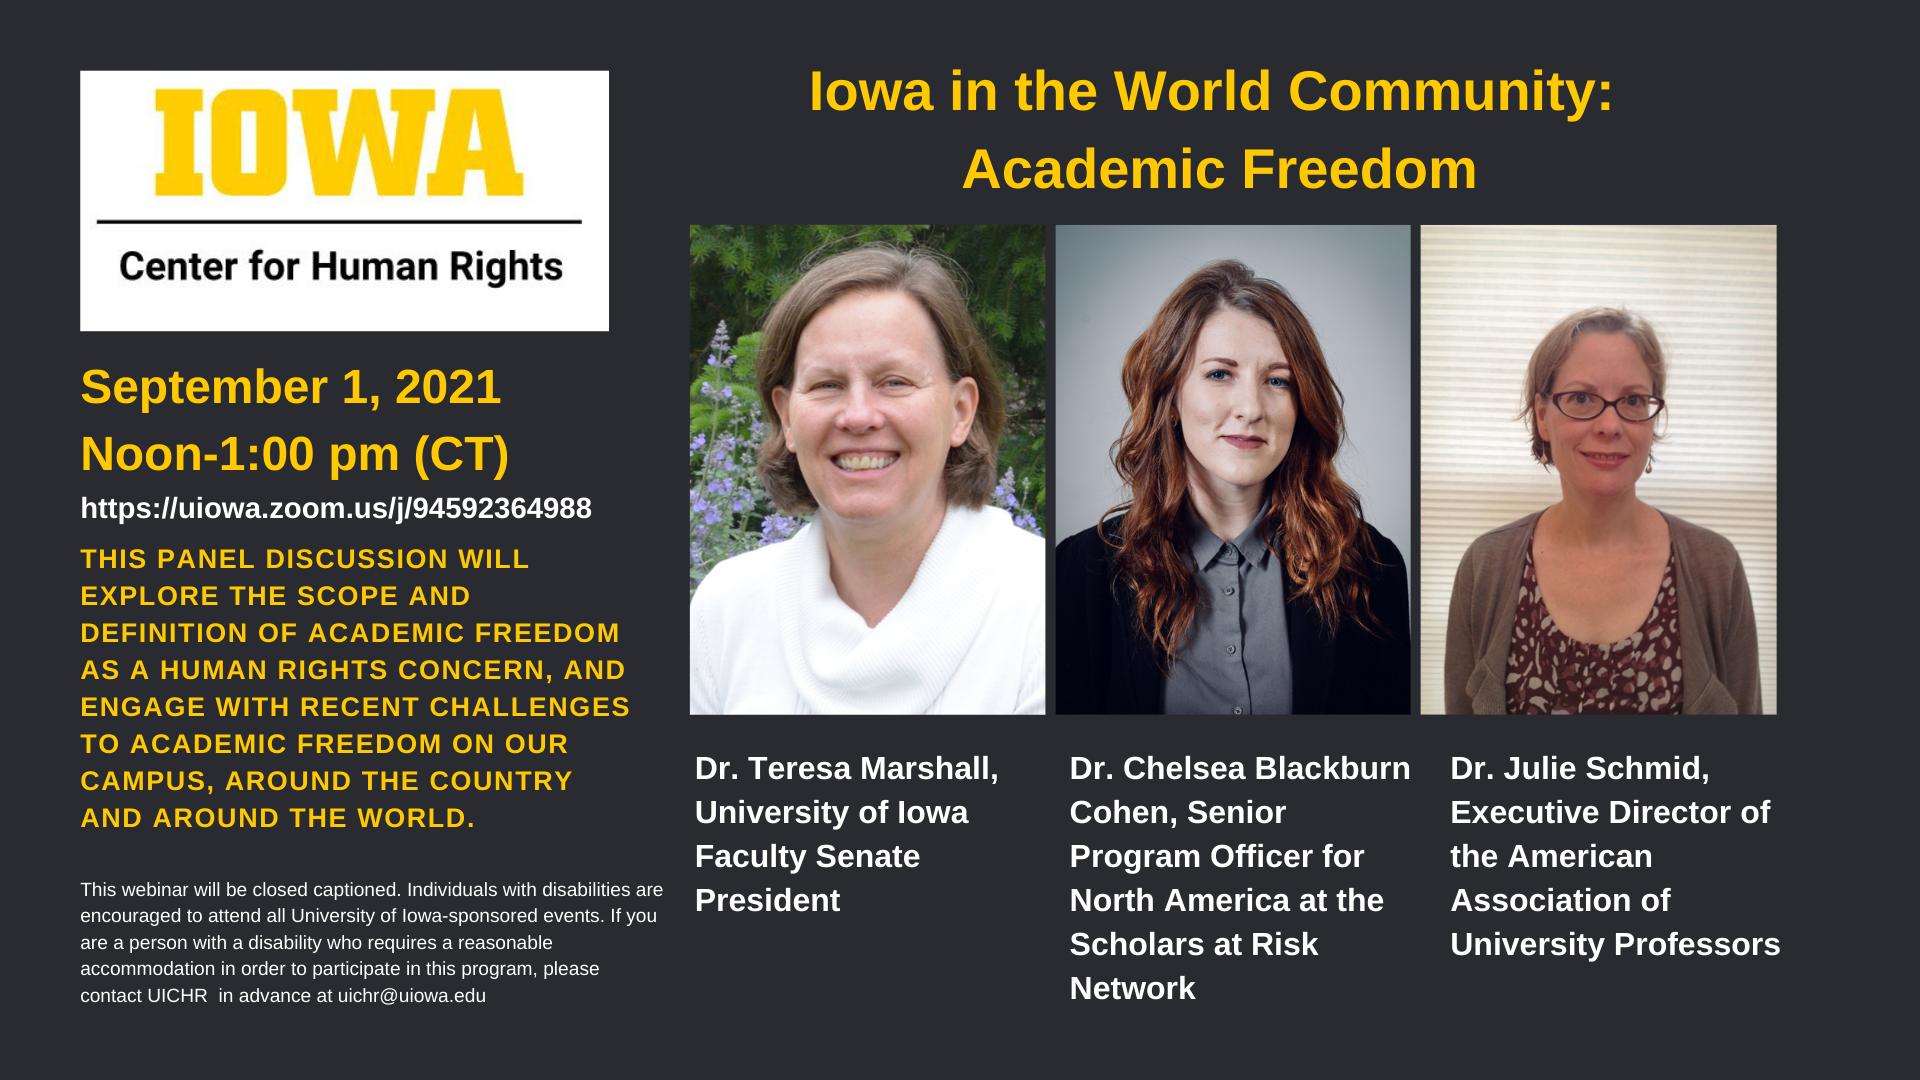 academic freedom panelists pictures